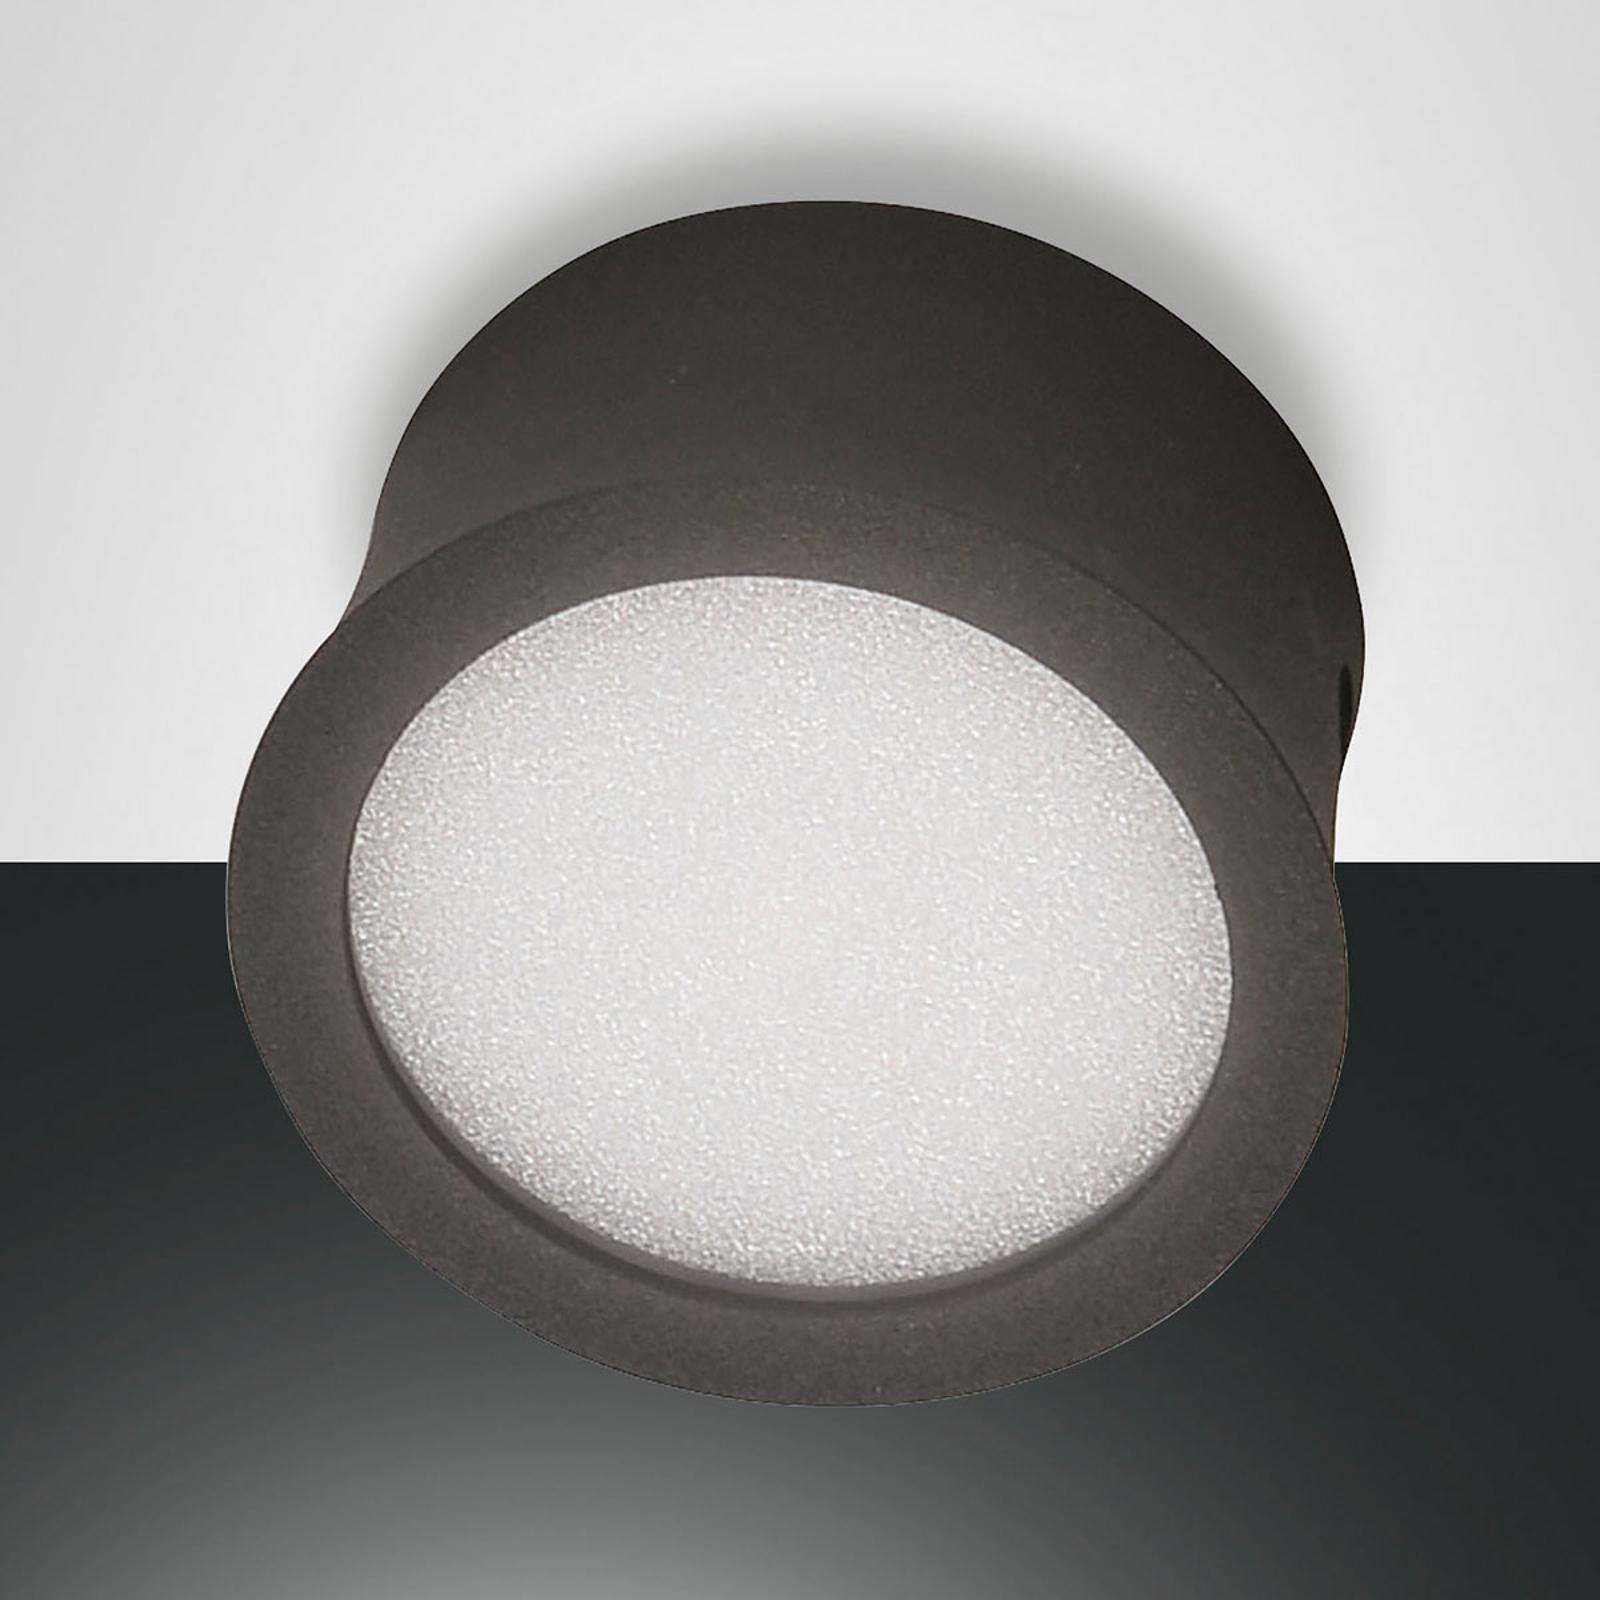 Antracietkleurige LED downlight Ponza concave vorm